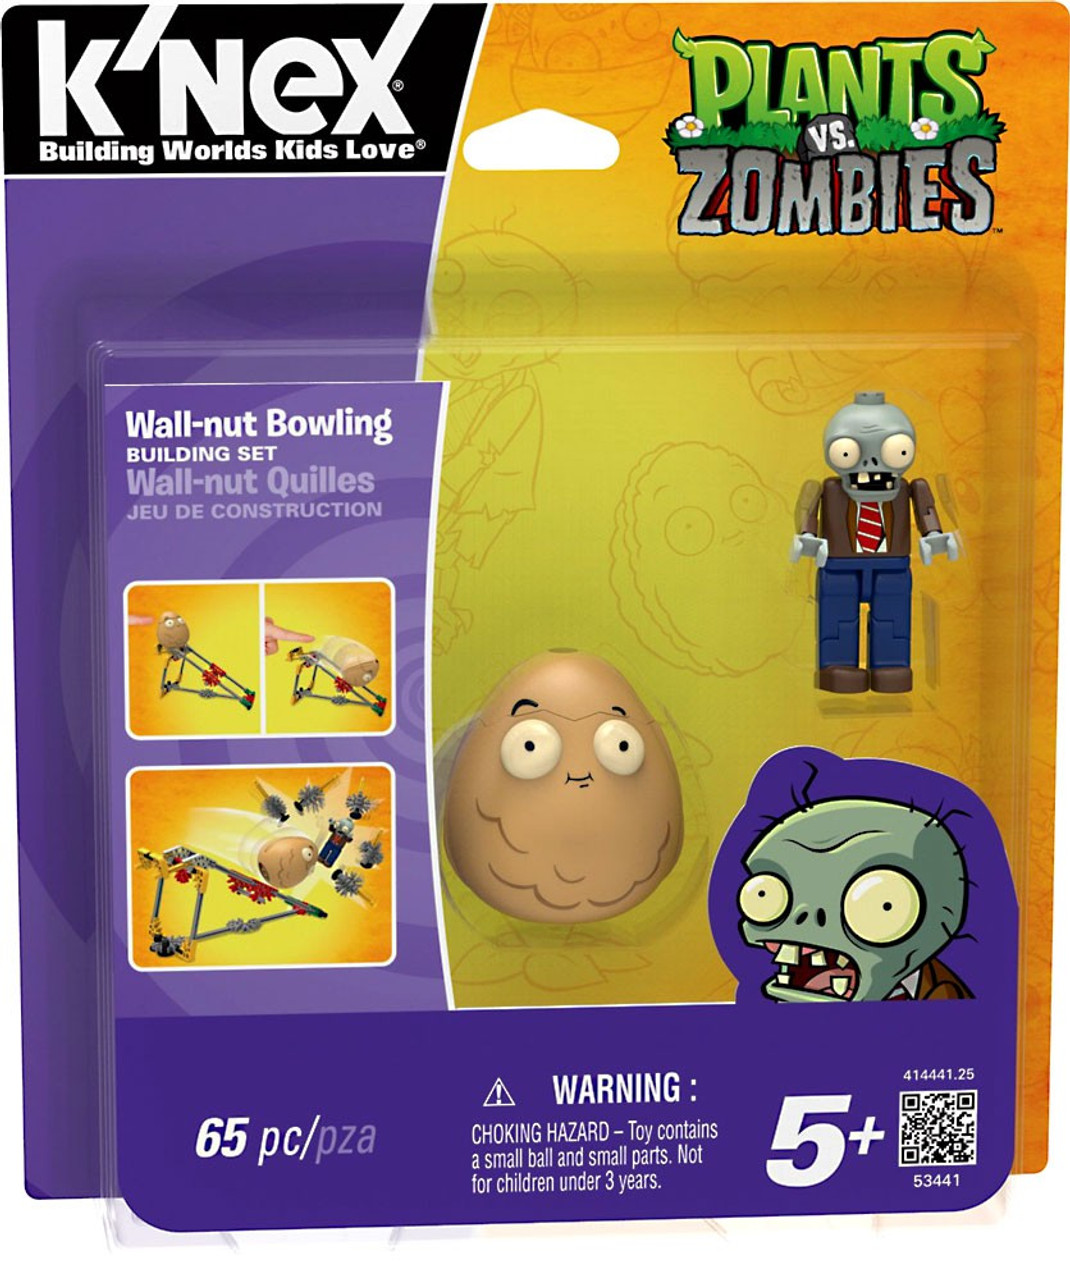 K'NEX Plants vs. Zombies Wall-Nut Bowling Set #53441